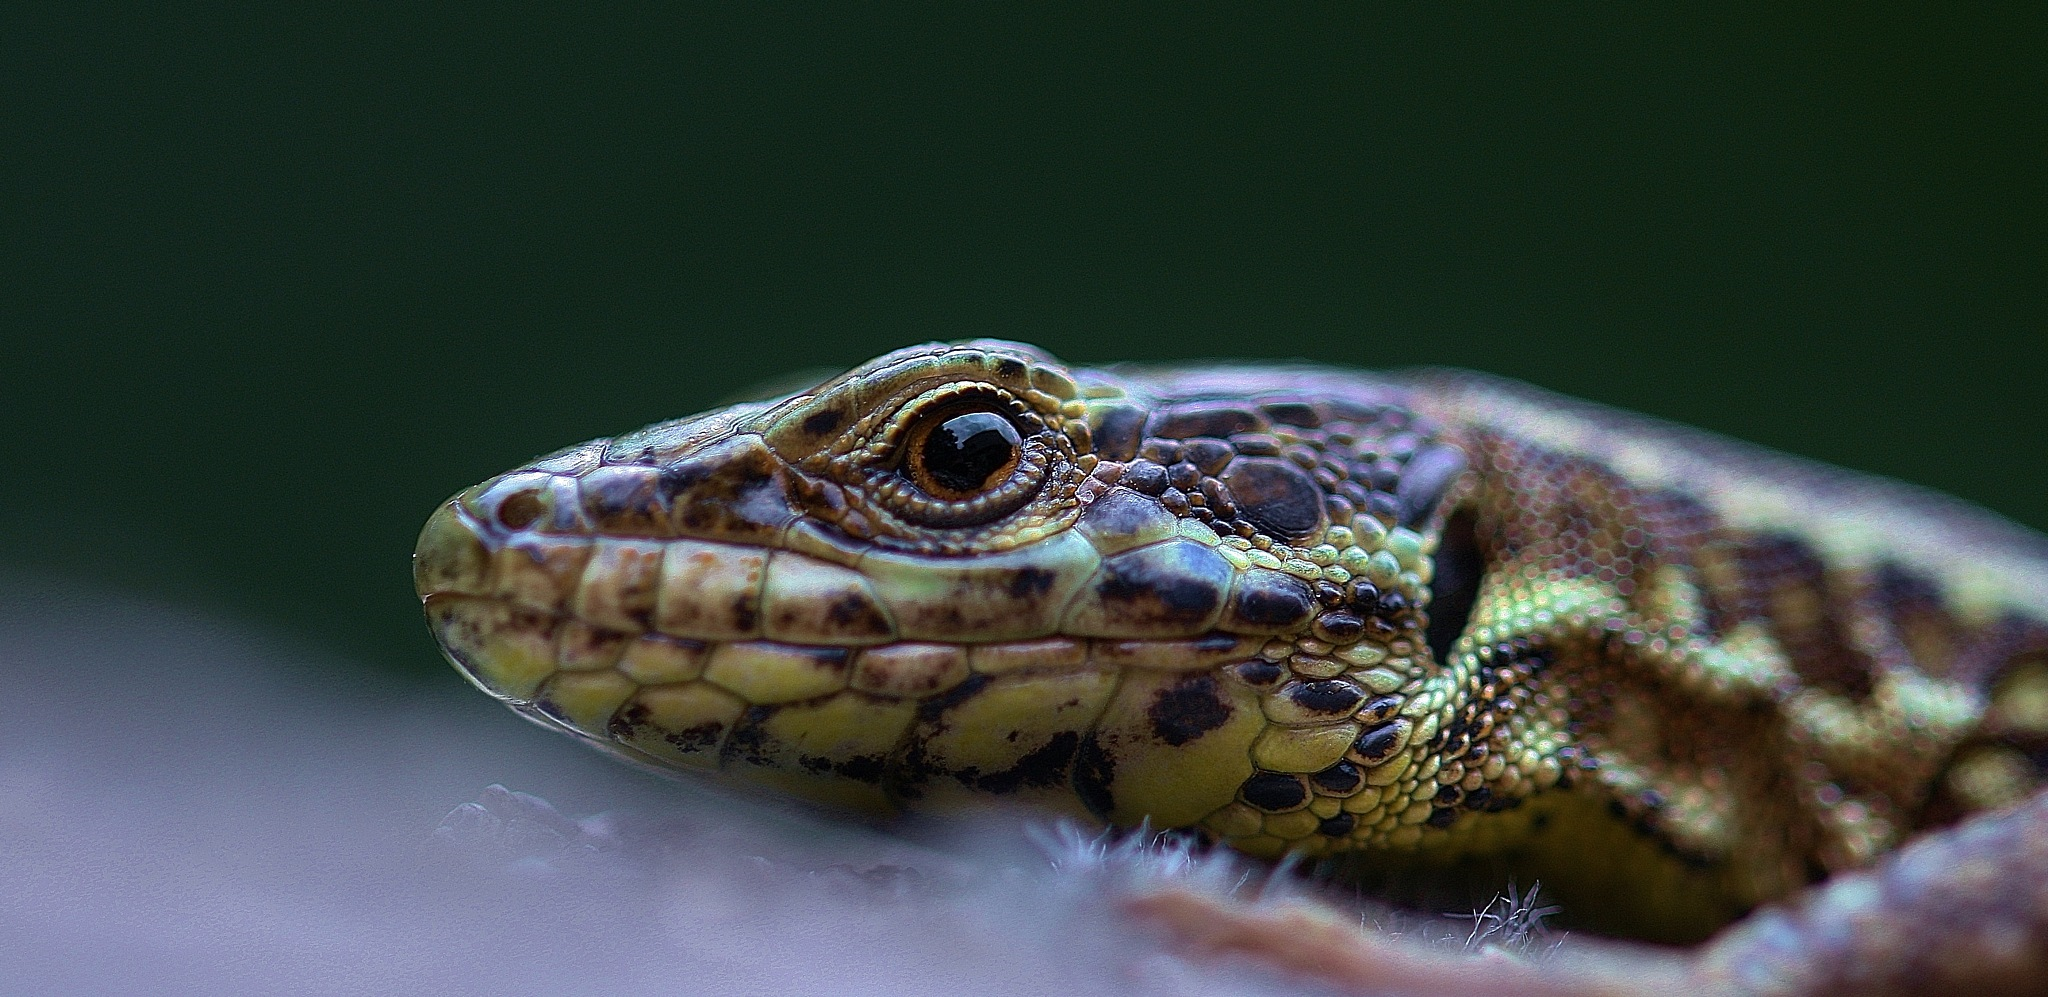 lizard by Paolo Calò photography